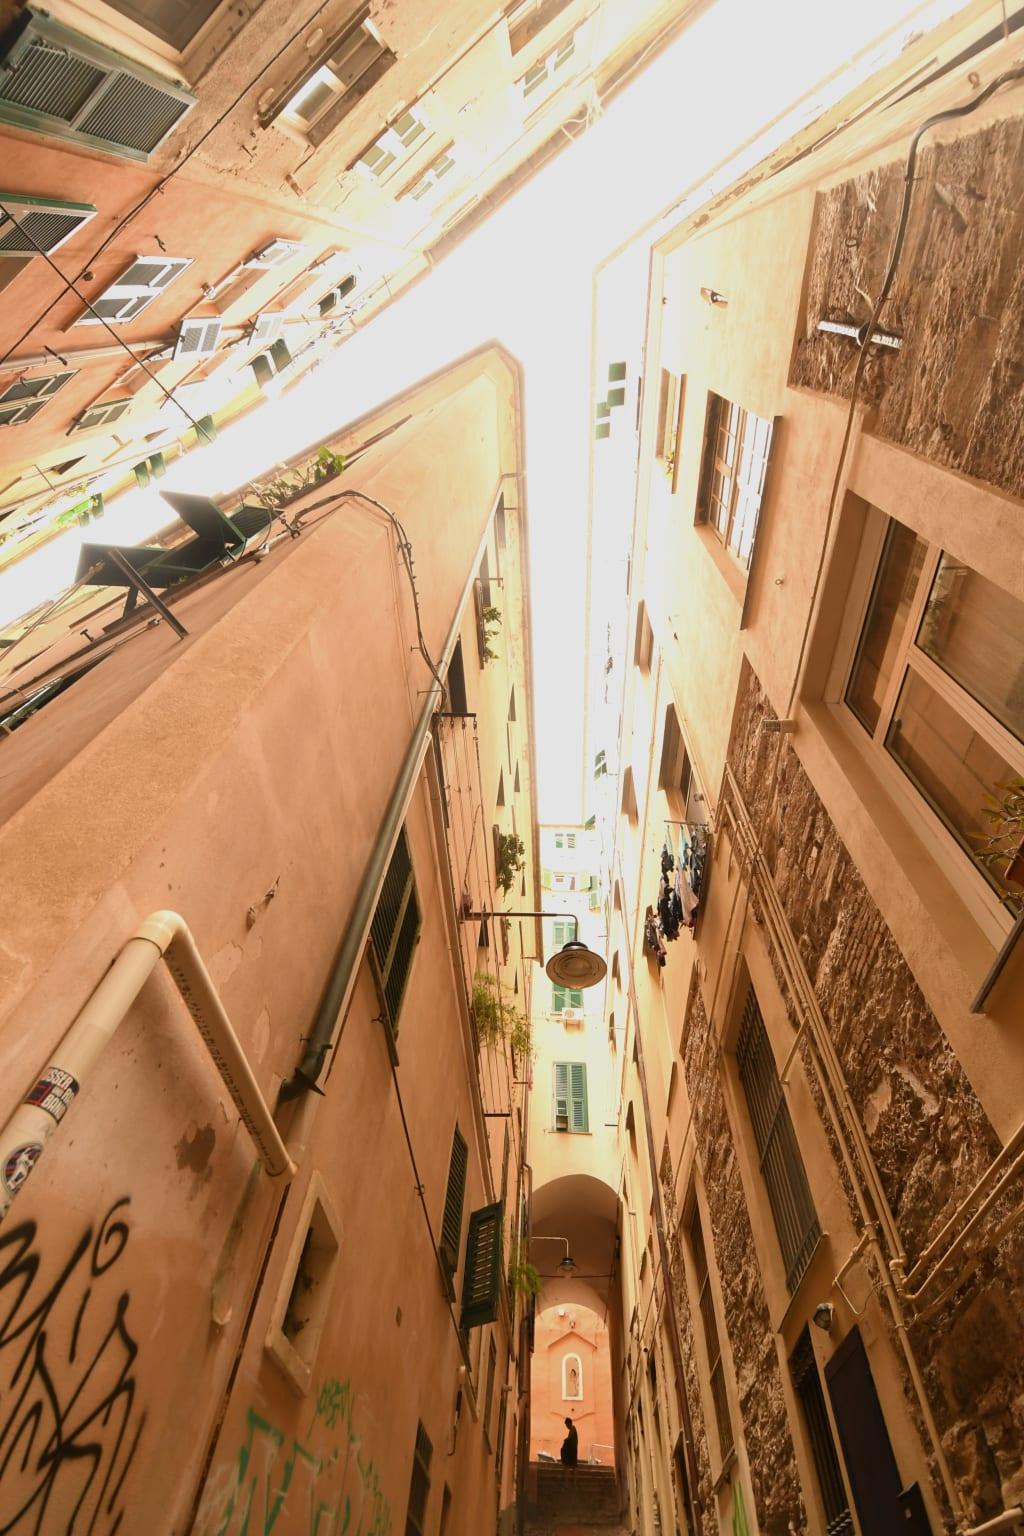 Altstadthäuser von unten